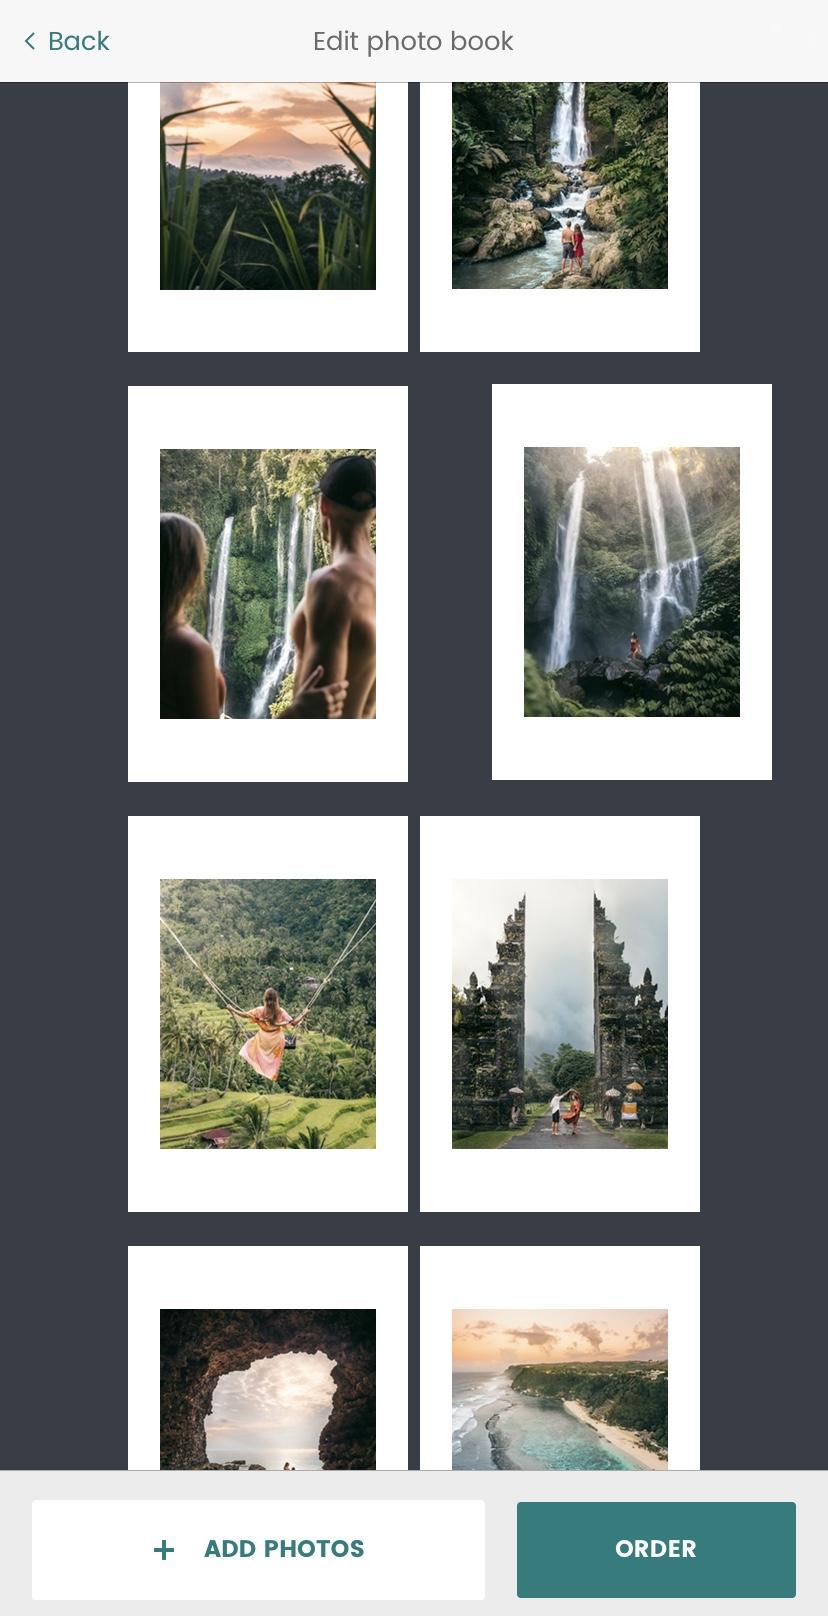 Sort the photos in SubBook